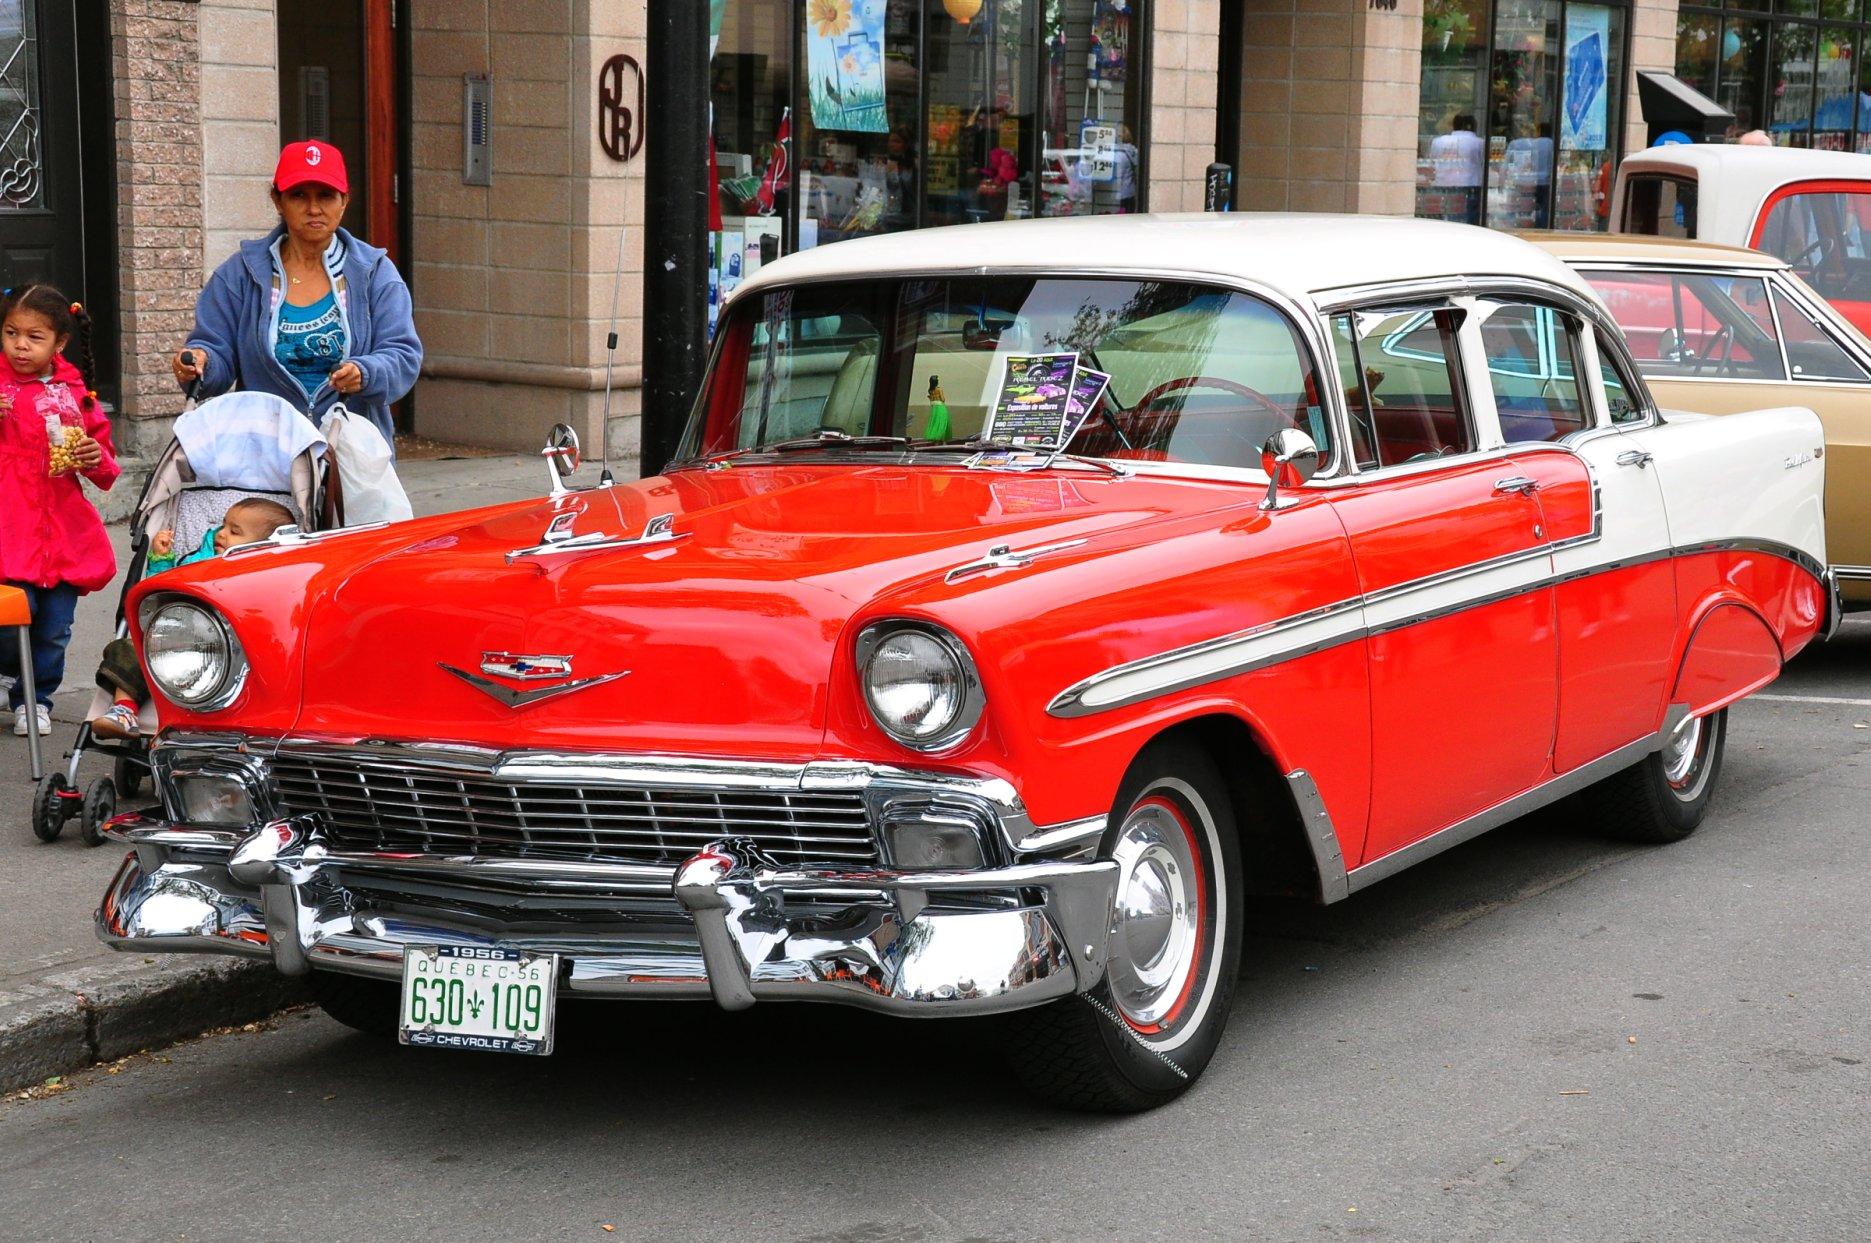 File:Chevrolet Bel Air 1956 (5864658507).jpg - Wikimedia Commons